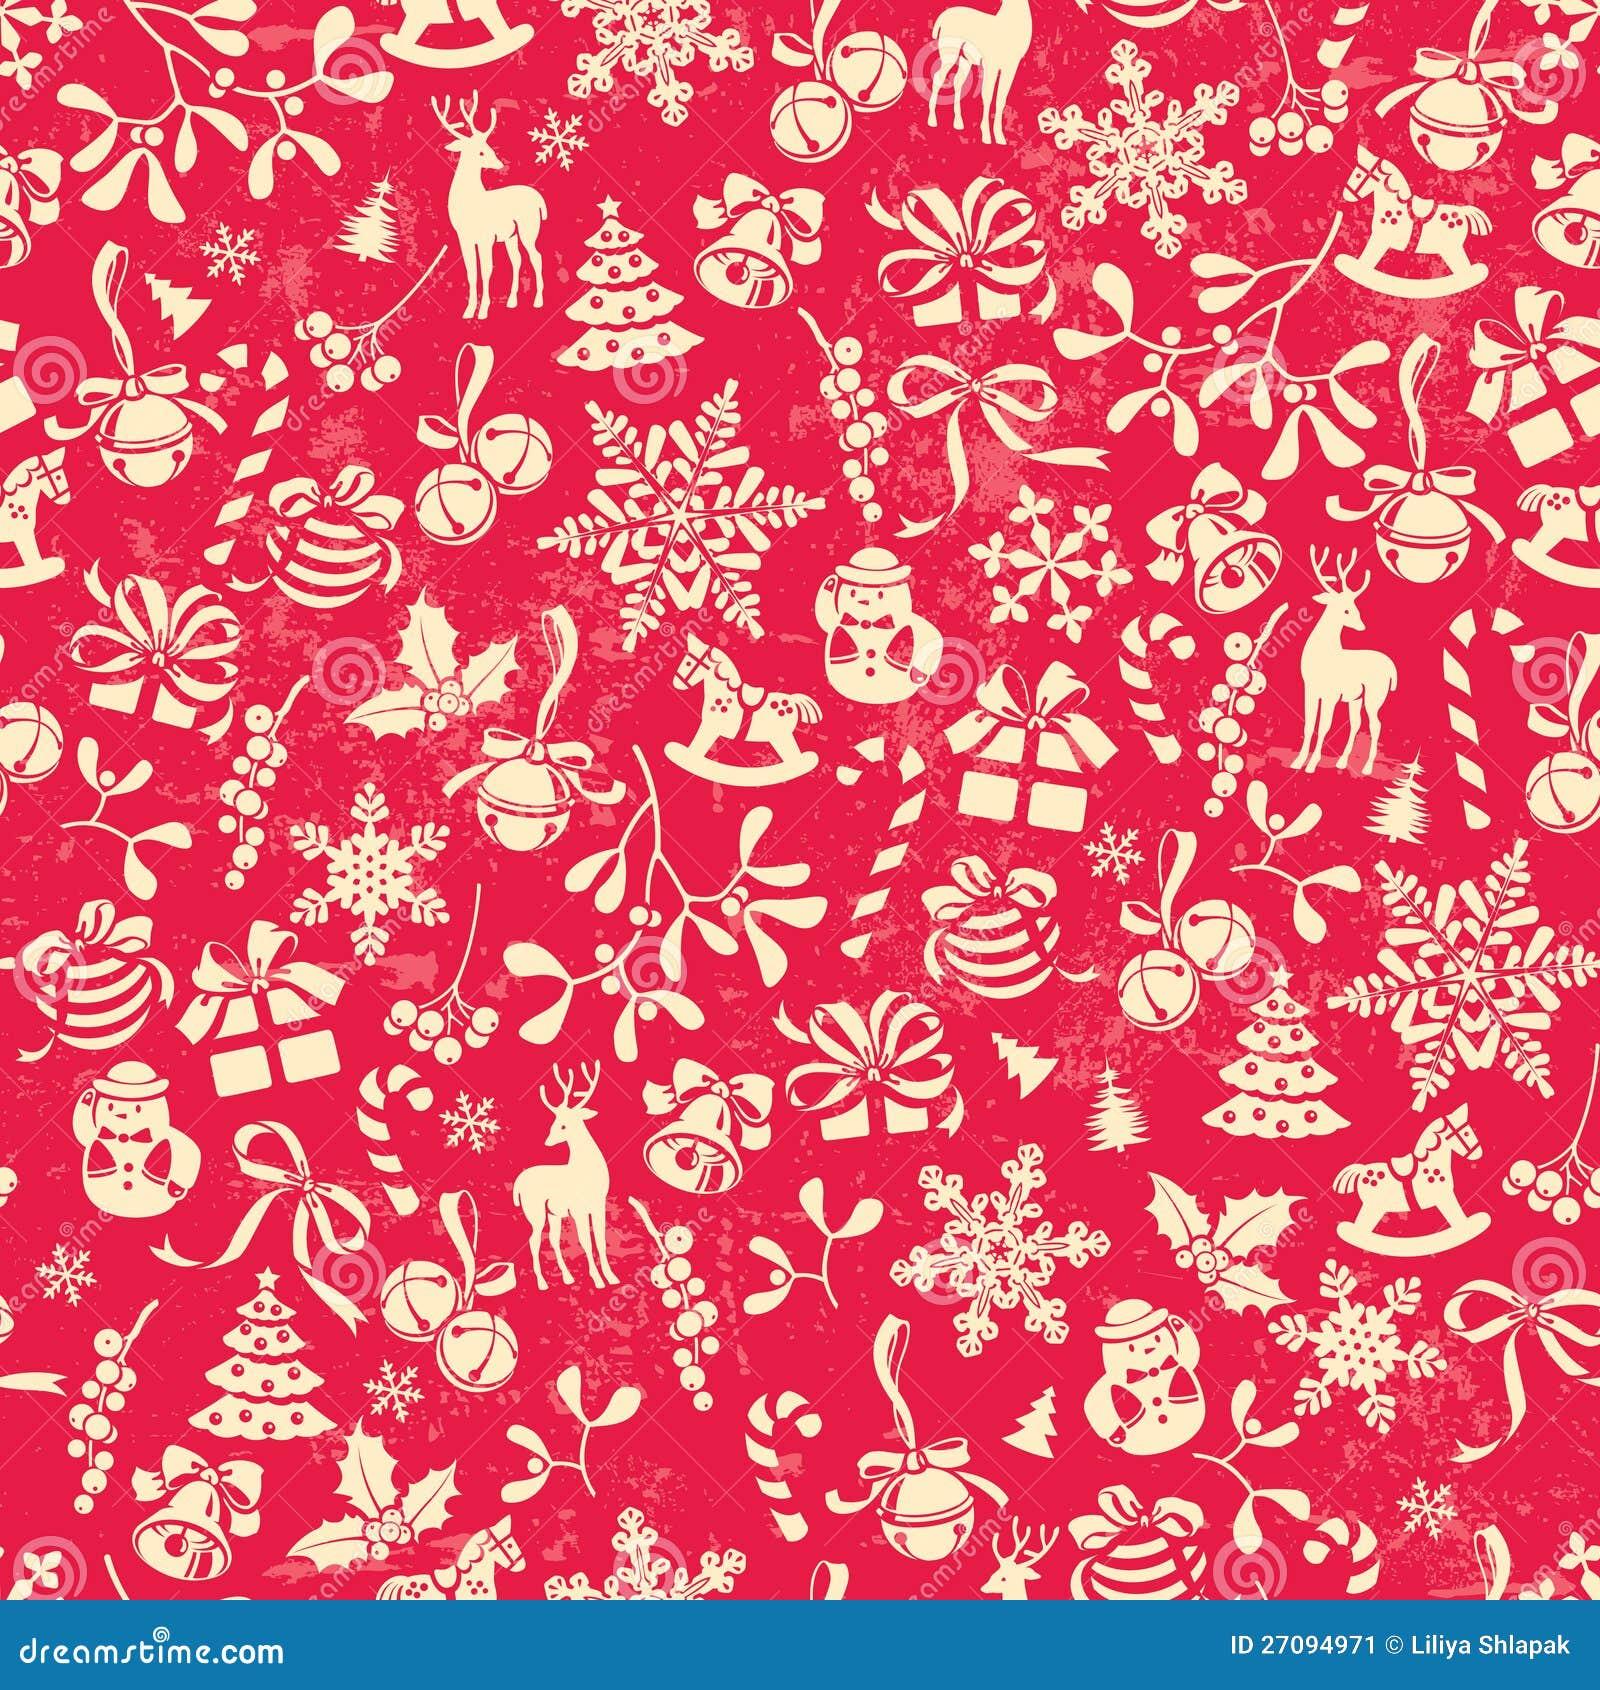 Christmas Pattern Stock Image - Image: 27094971